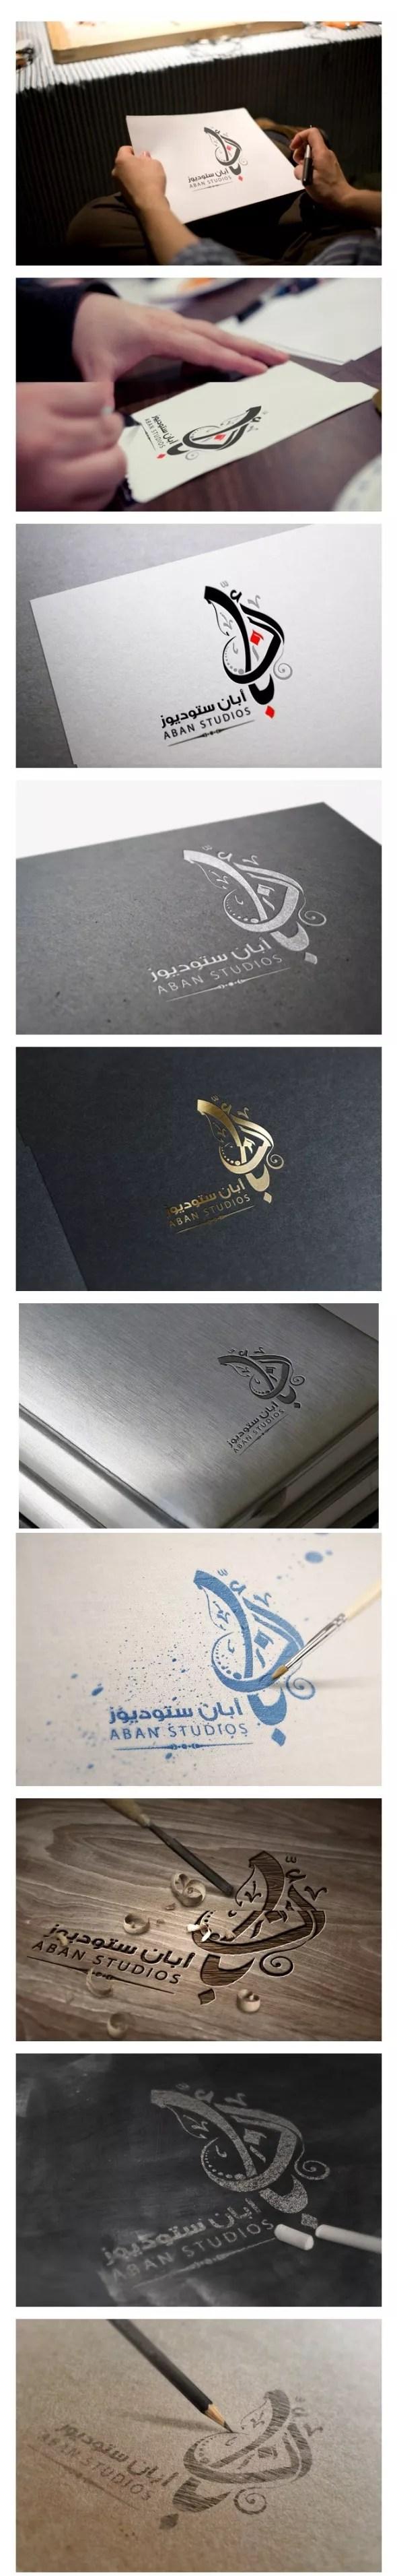 Aban Studios  Arabic Typography